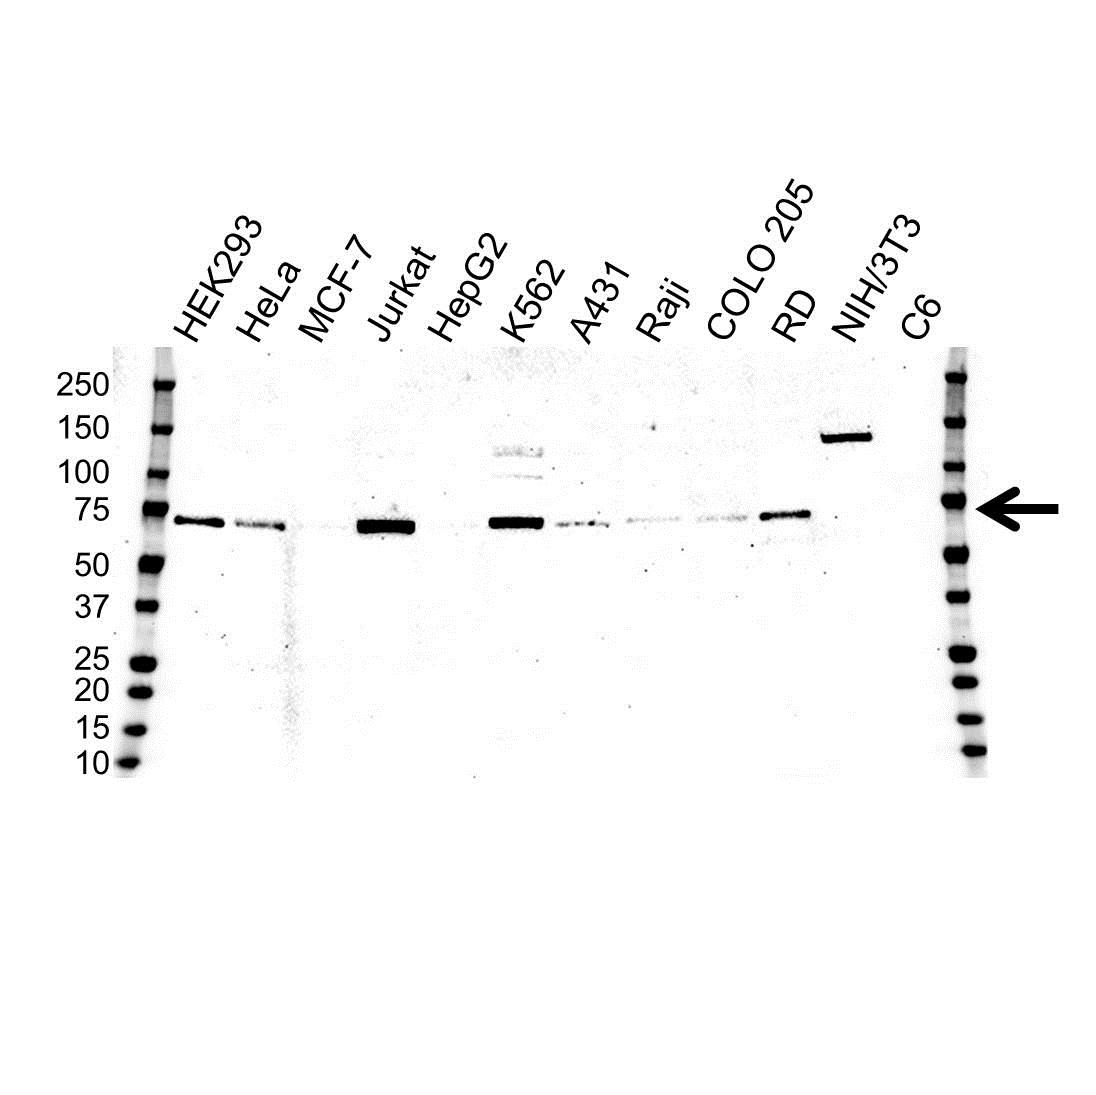 CHAF1B Antibody (PrecisionAb<sup>TM</sup> Antibody) | OTI2D5 gallery image 1